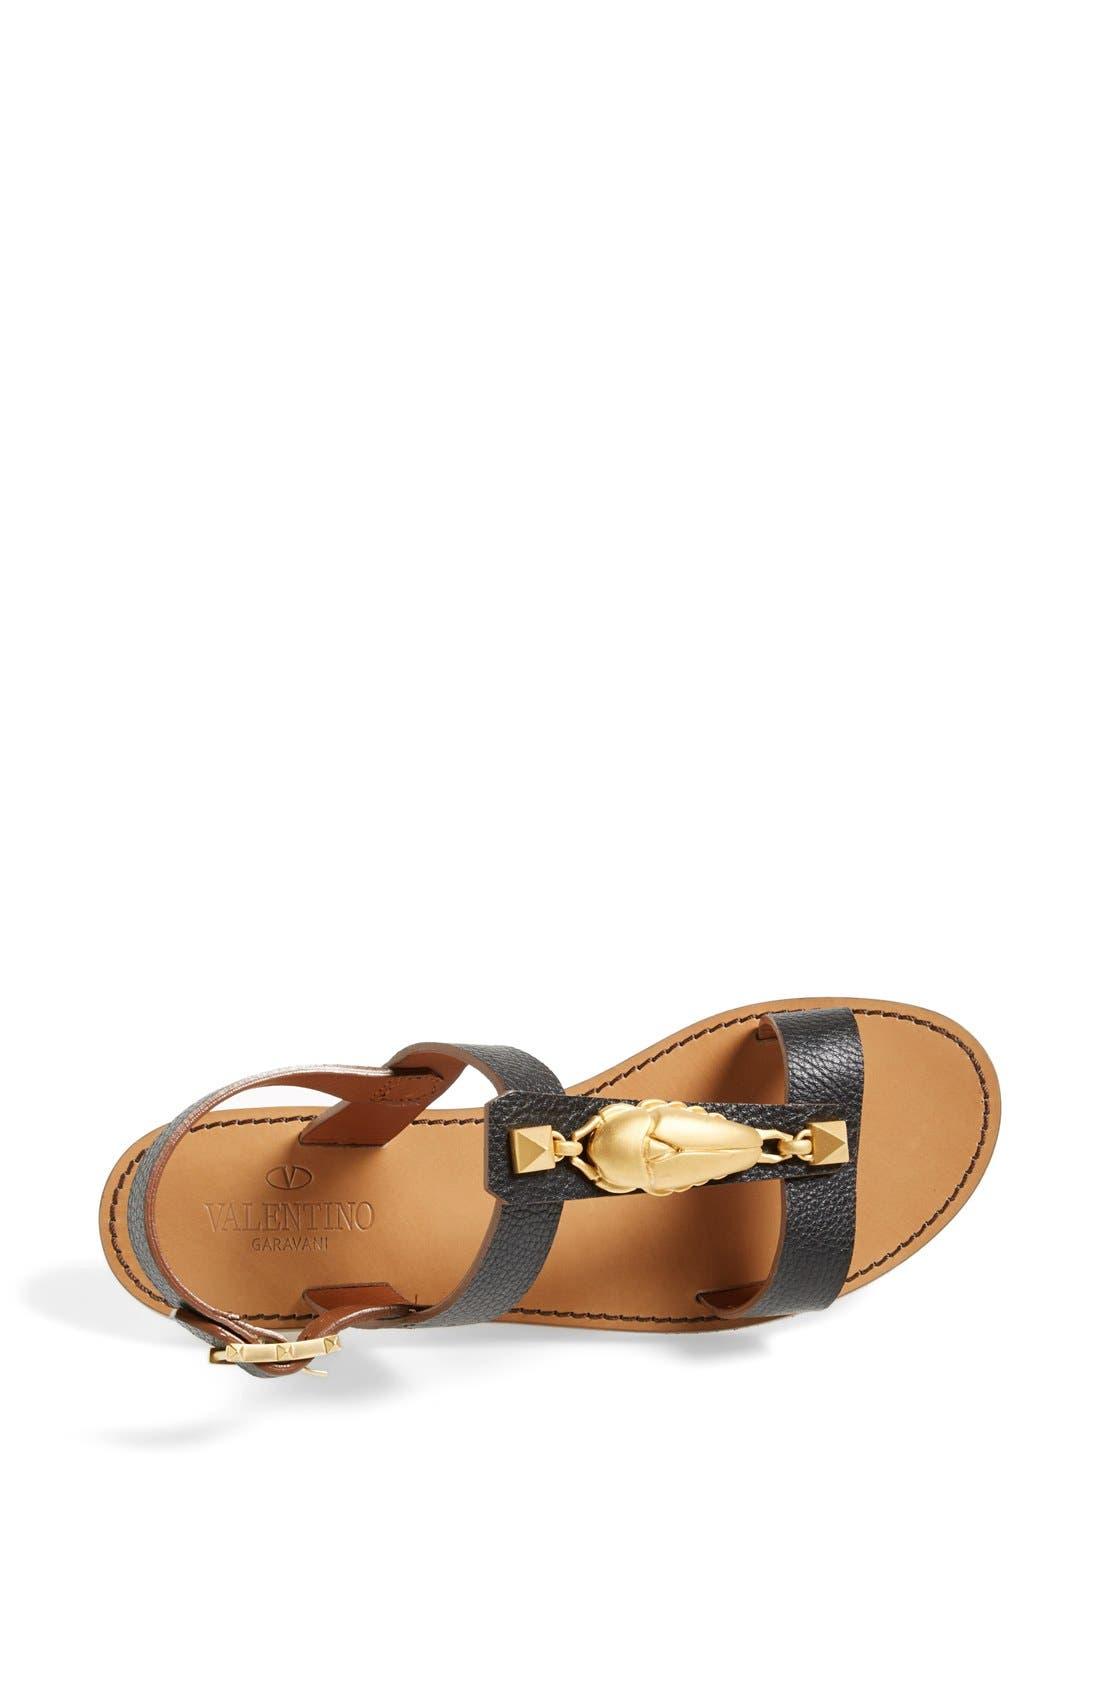 Alternate Image 3  - VALENTINO GARAVANI 'Scarab' Sandal